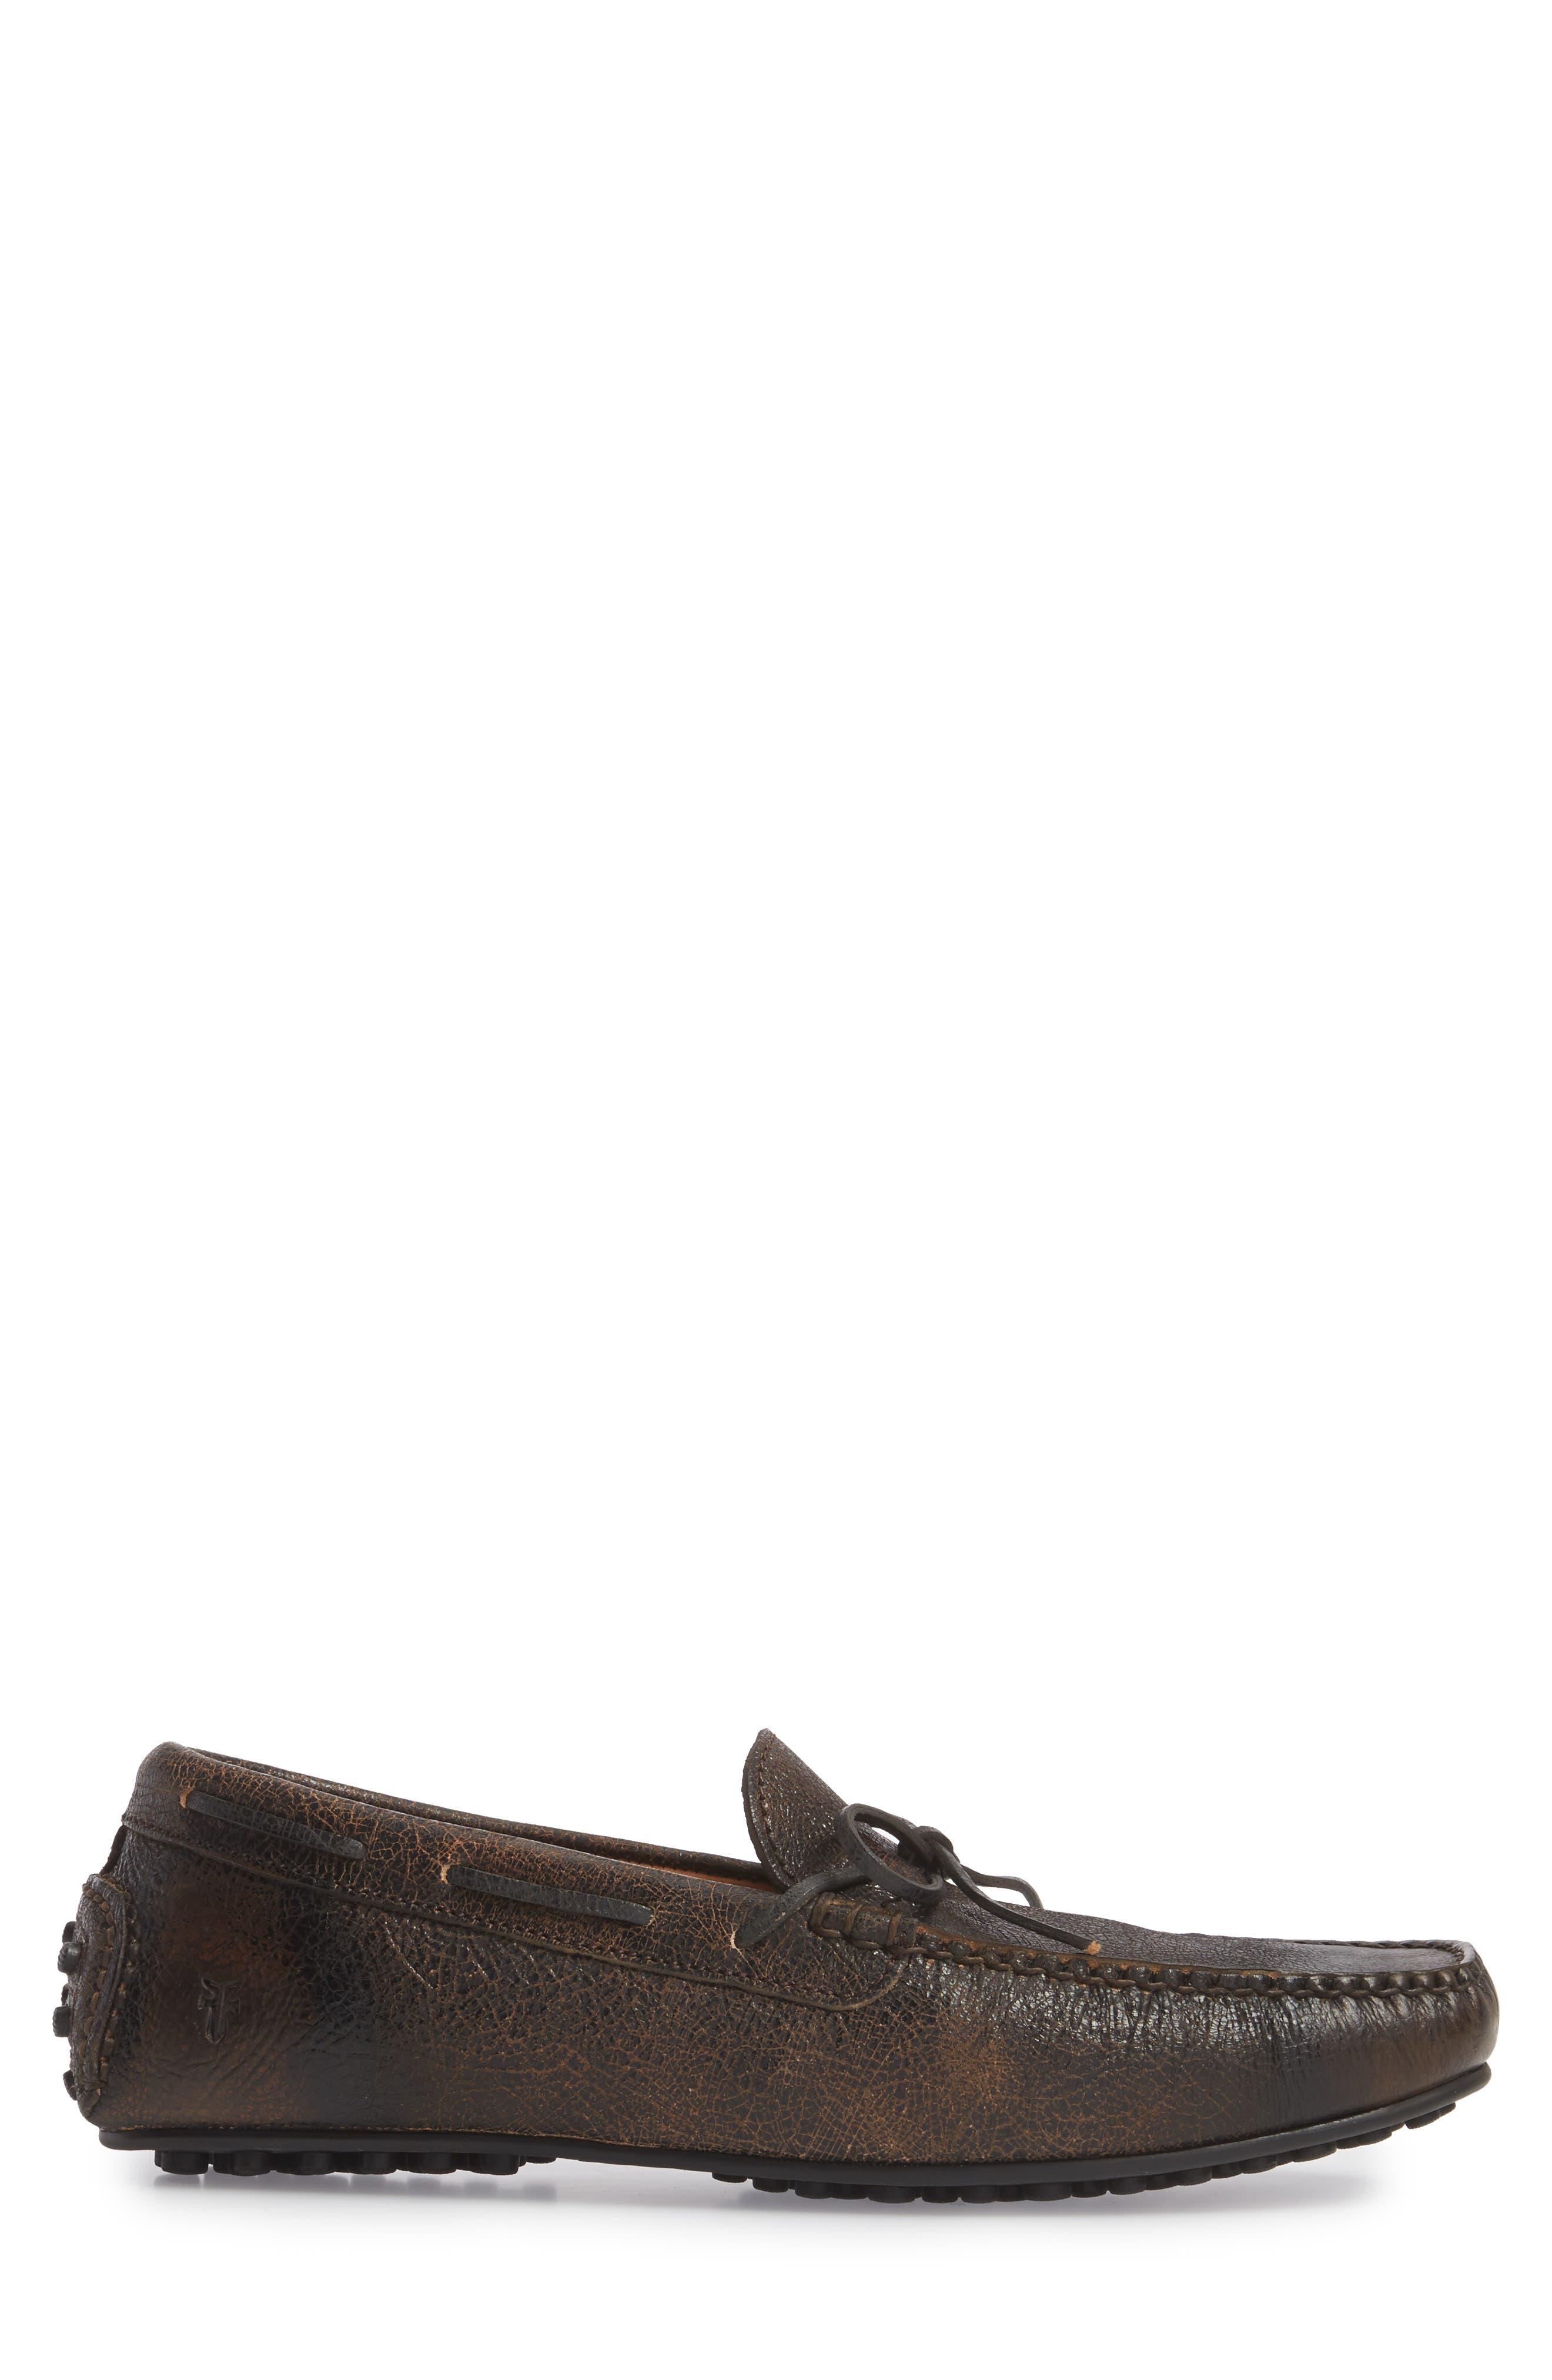 Allen Loafer,                             Alternate thumbnail 3, color,                             Dark Brown Leather